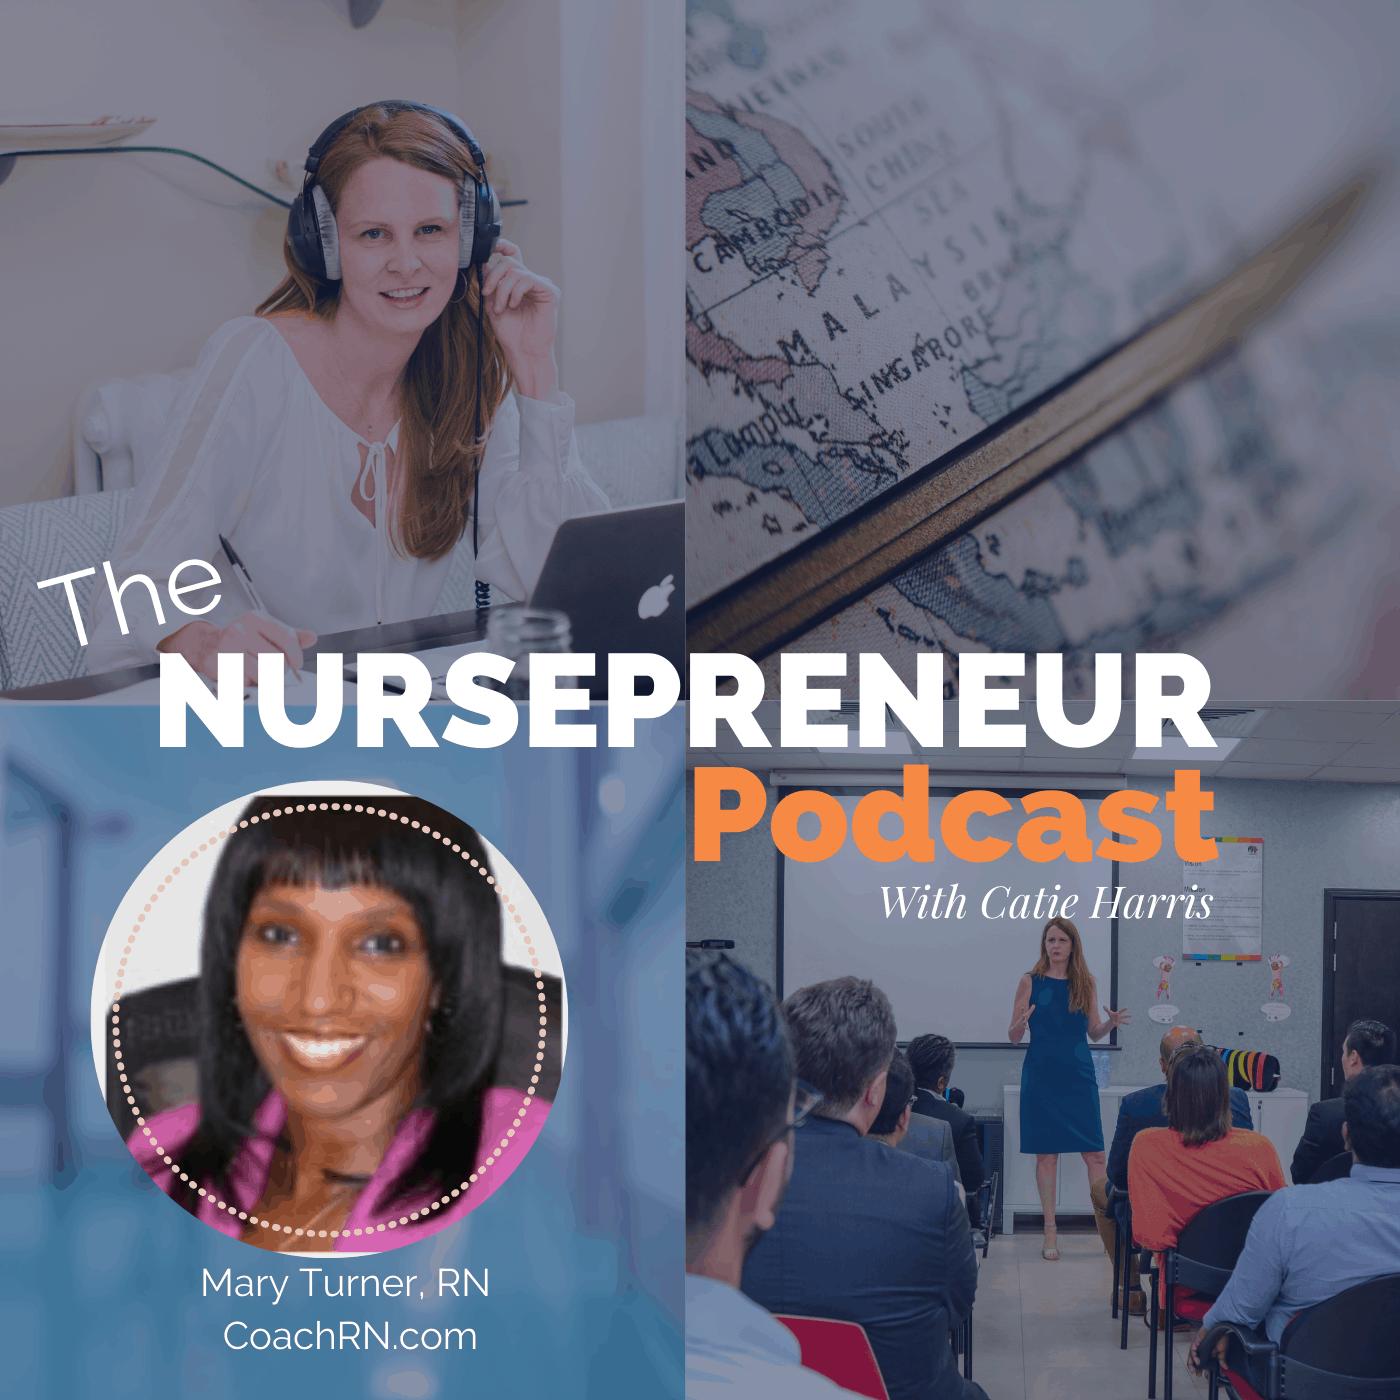 E-Myth Coach NursePreneur Podcast